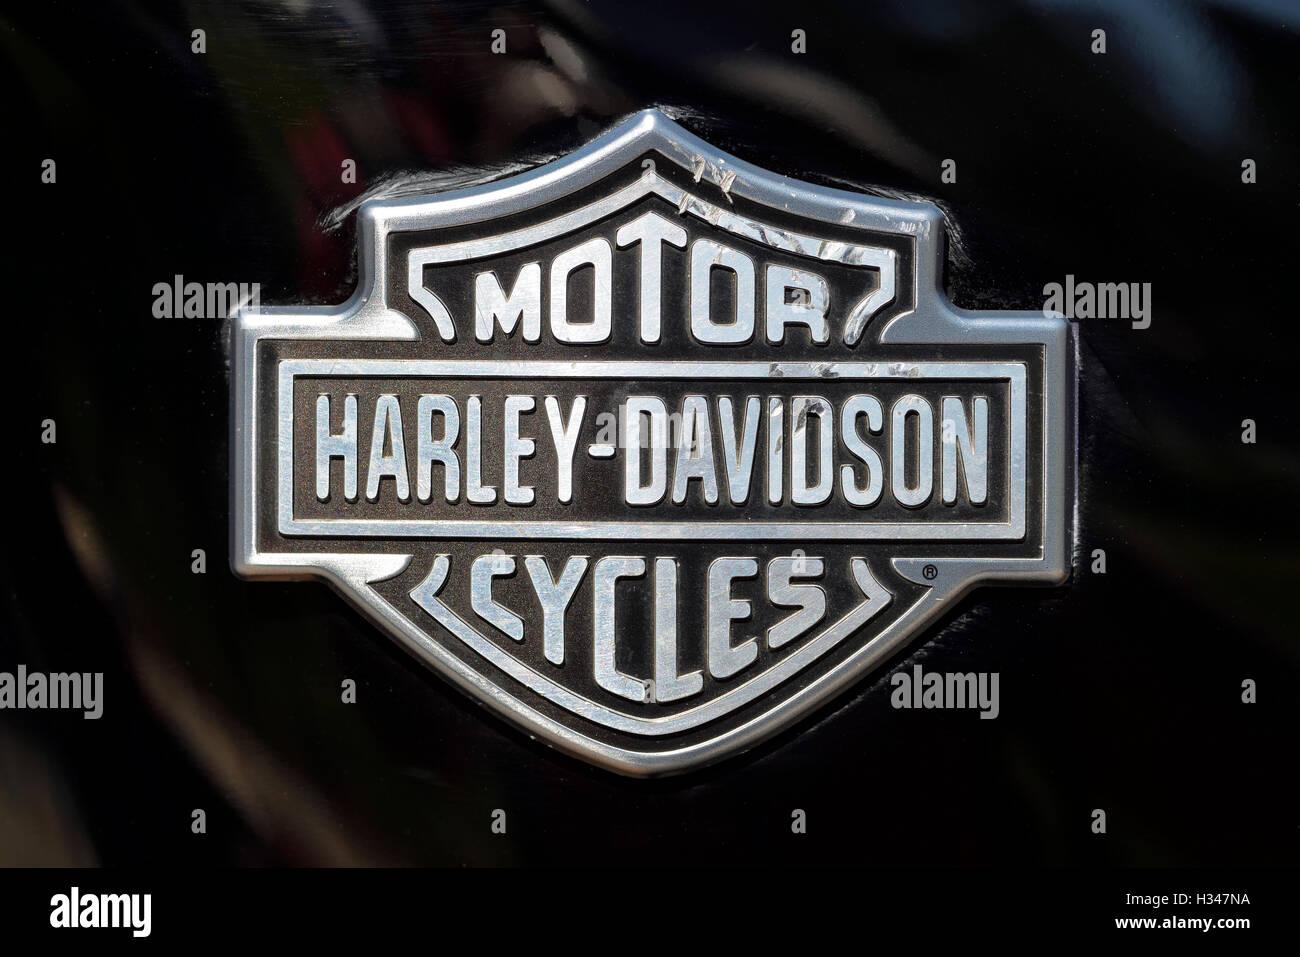 Harley-Davidson badge - Stock Image